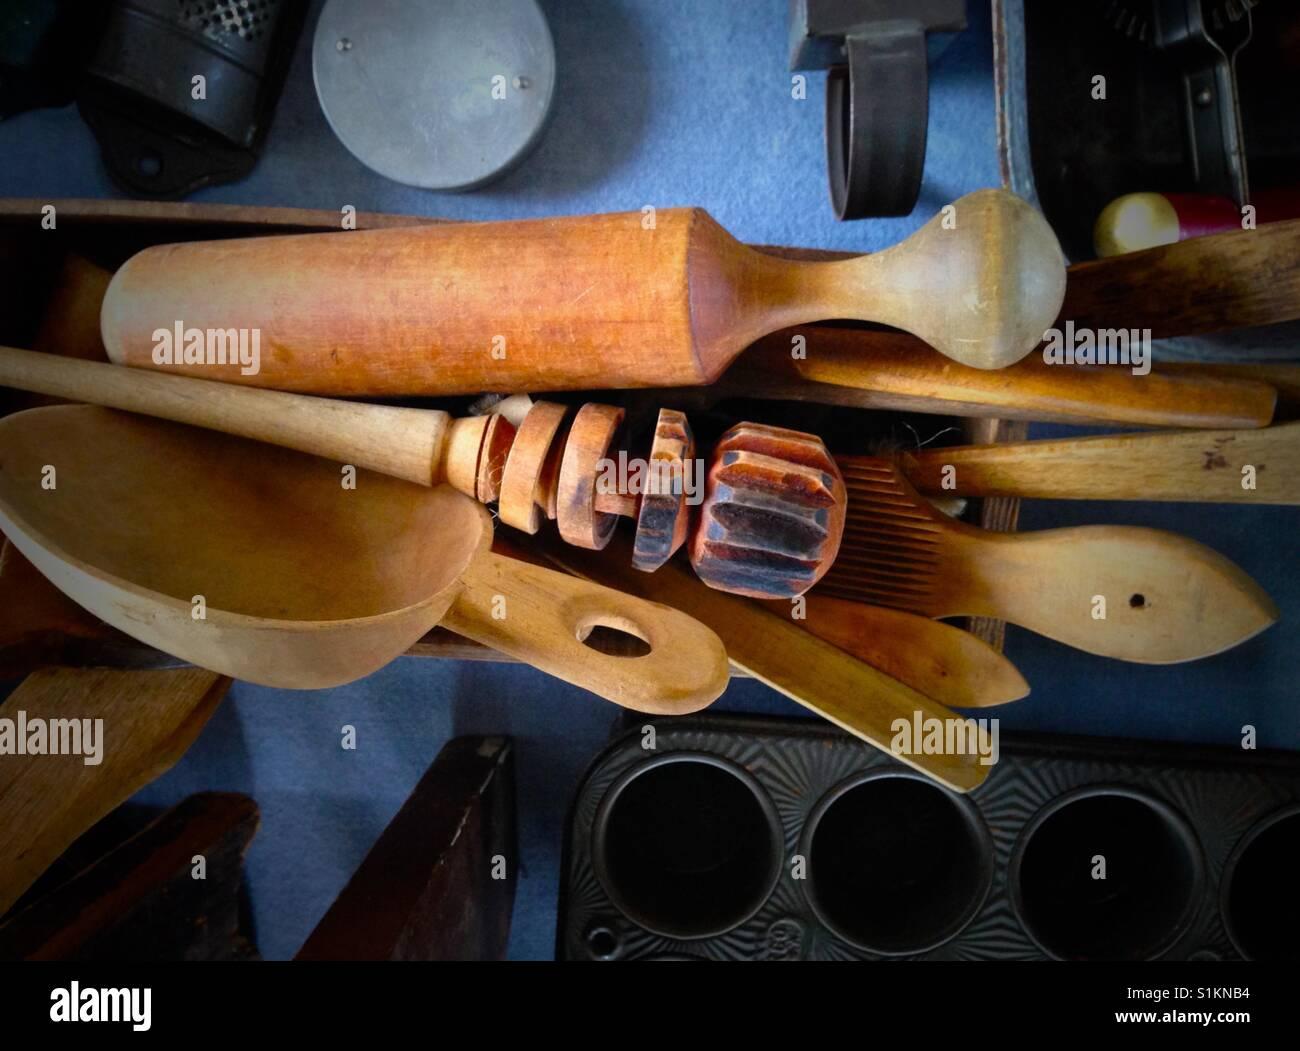 Antique wooden kitchen utensils. - Stock Image